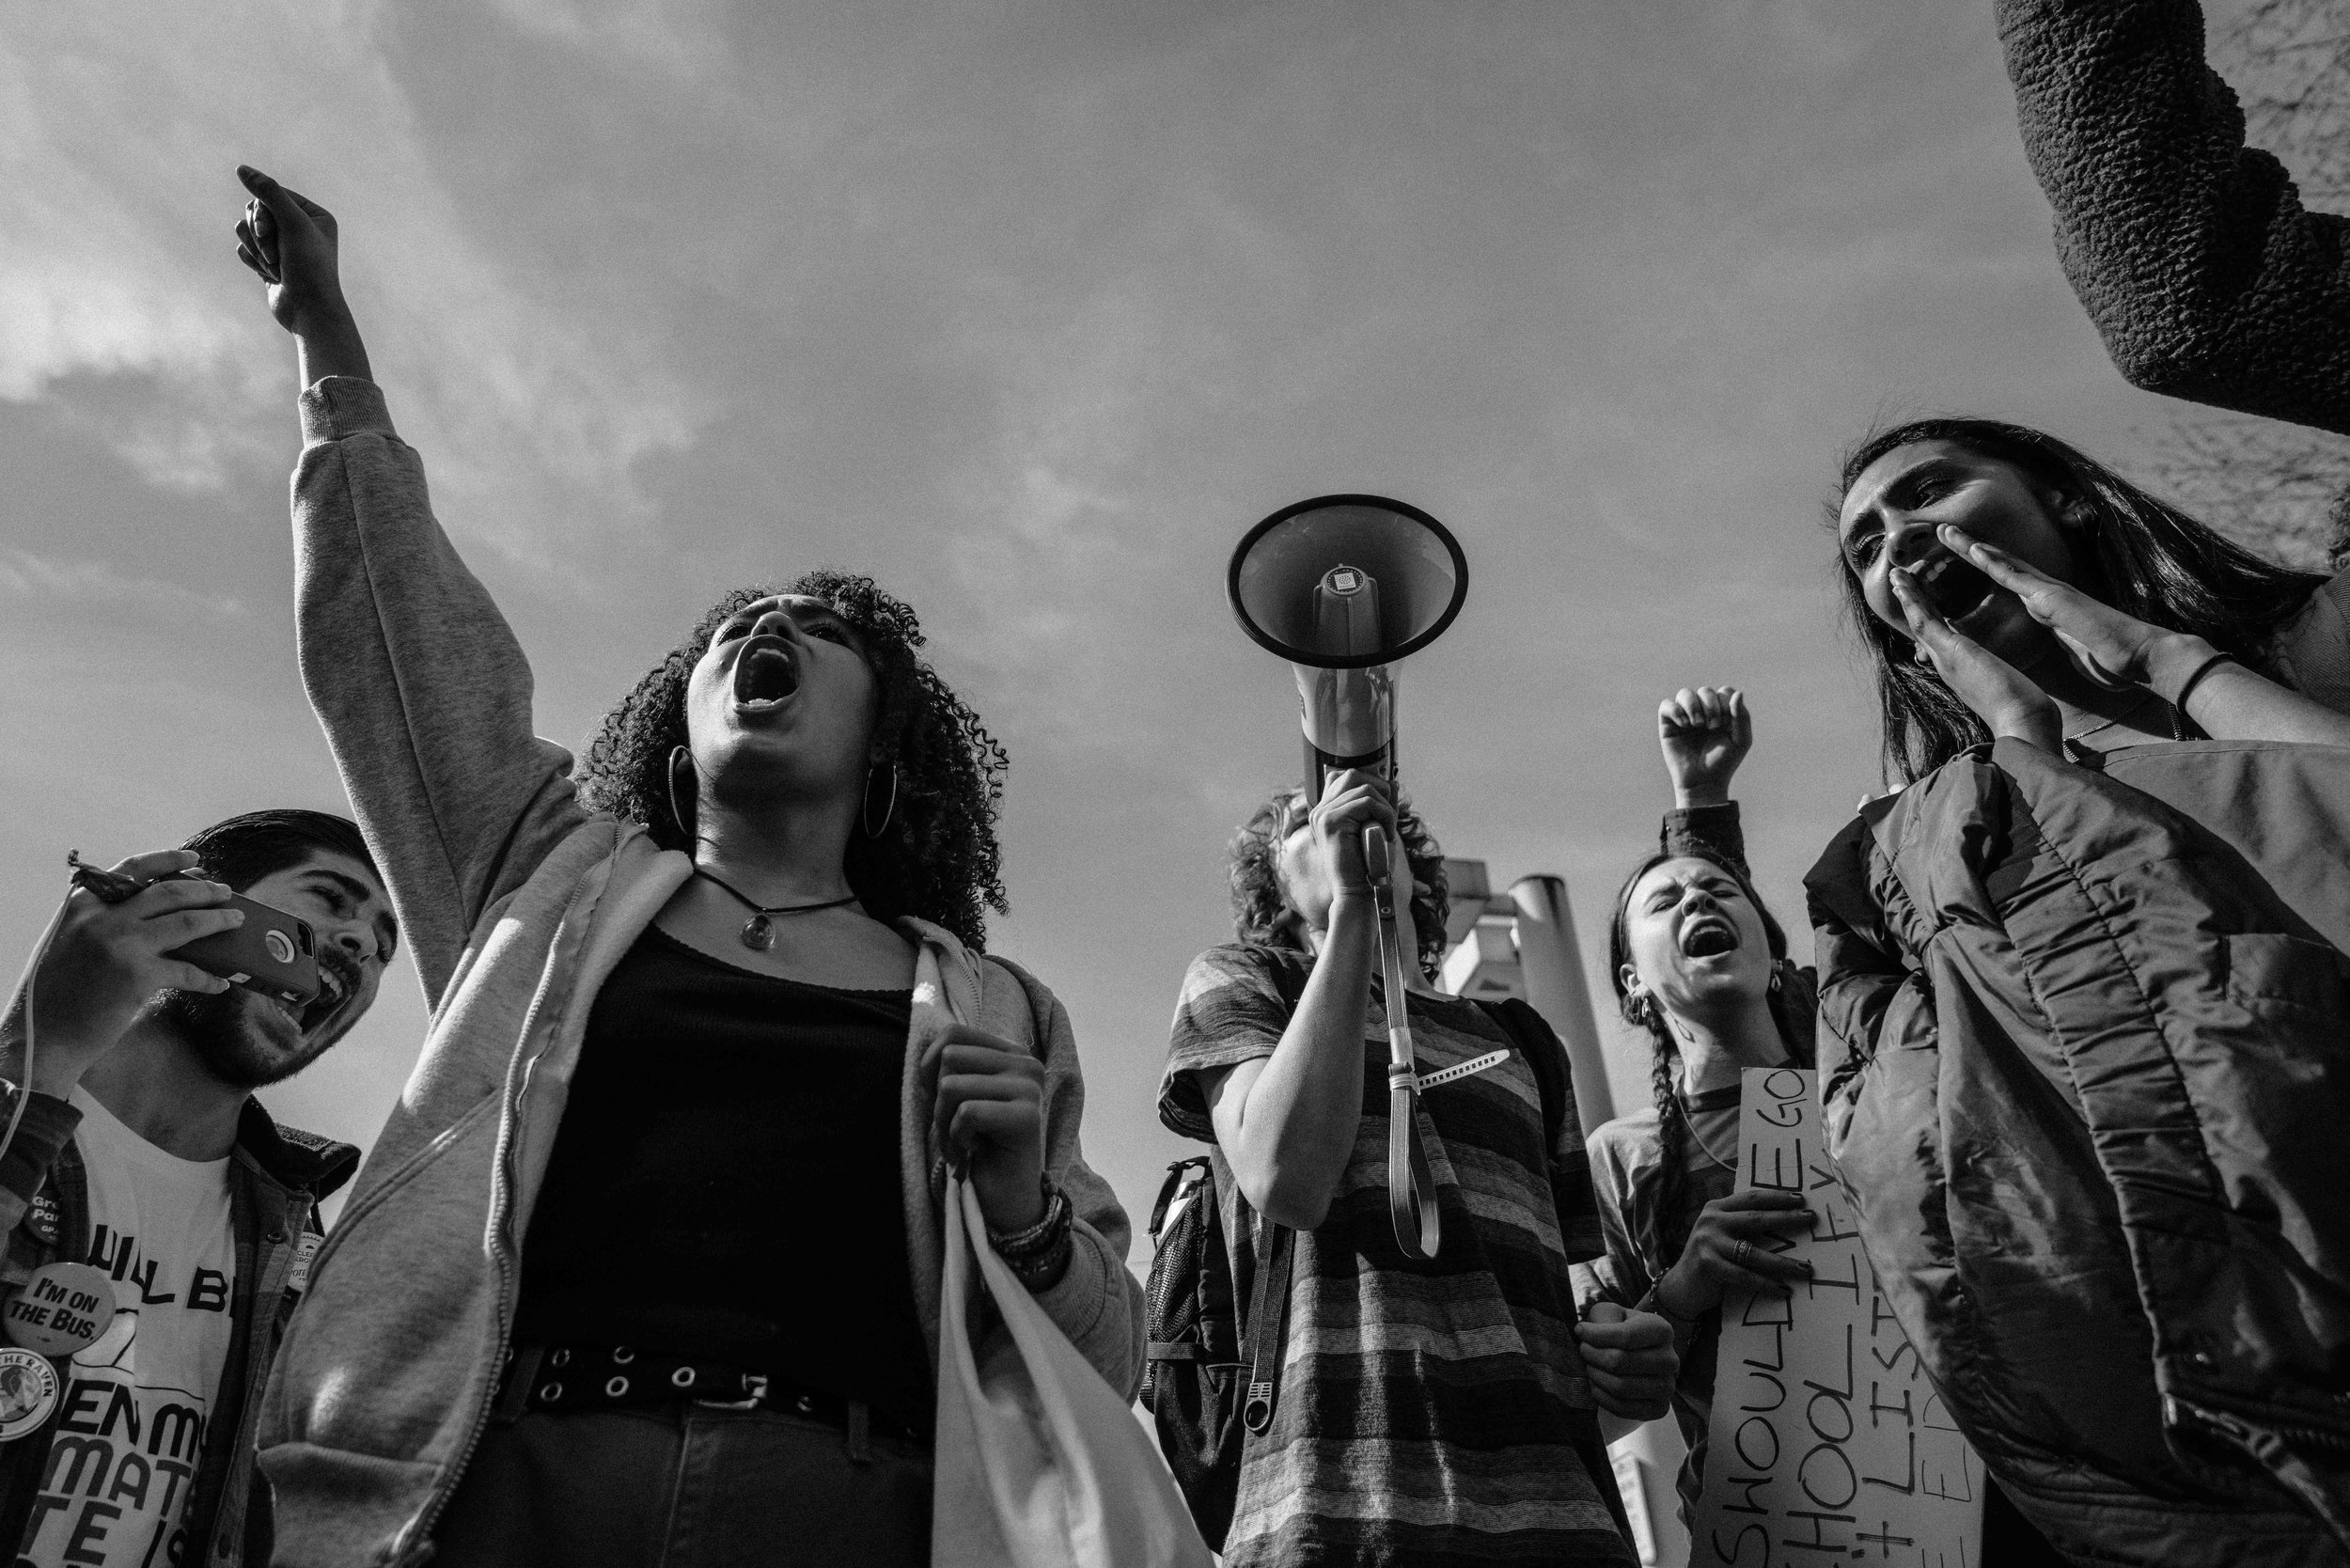 josue-rivas-portland-student-climate-change-march-protest.jpg